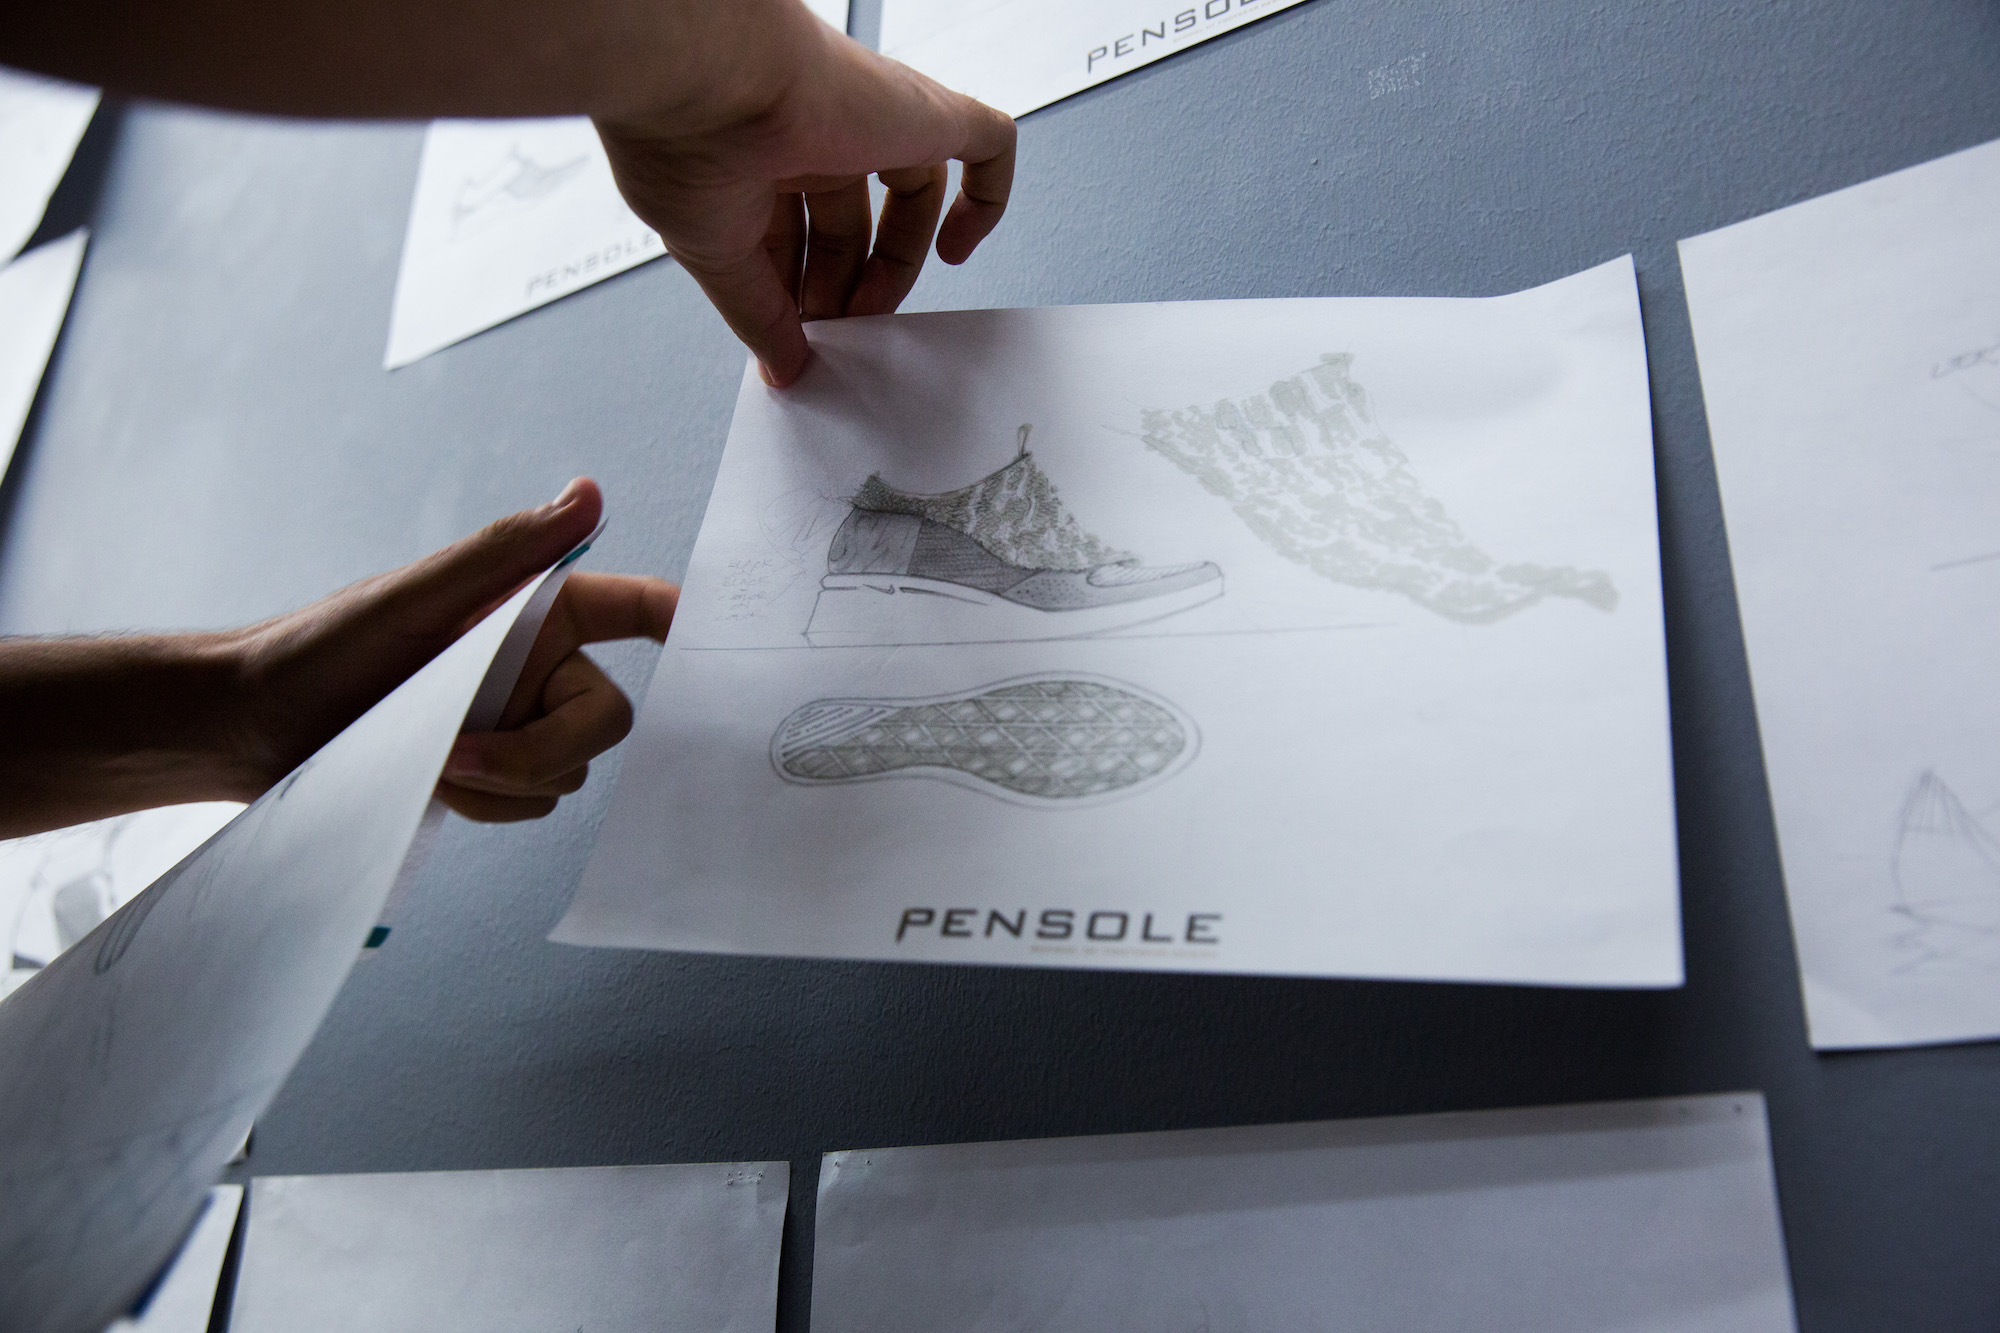 pensole Kolding School of Design 9